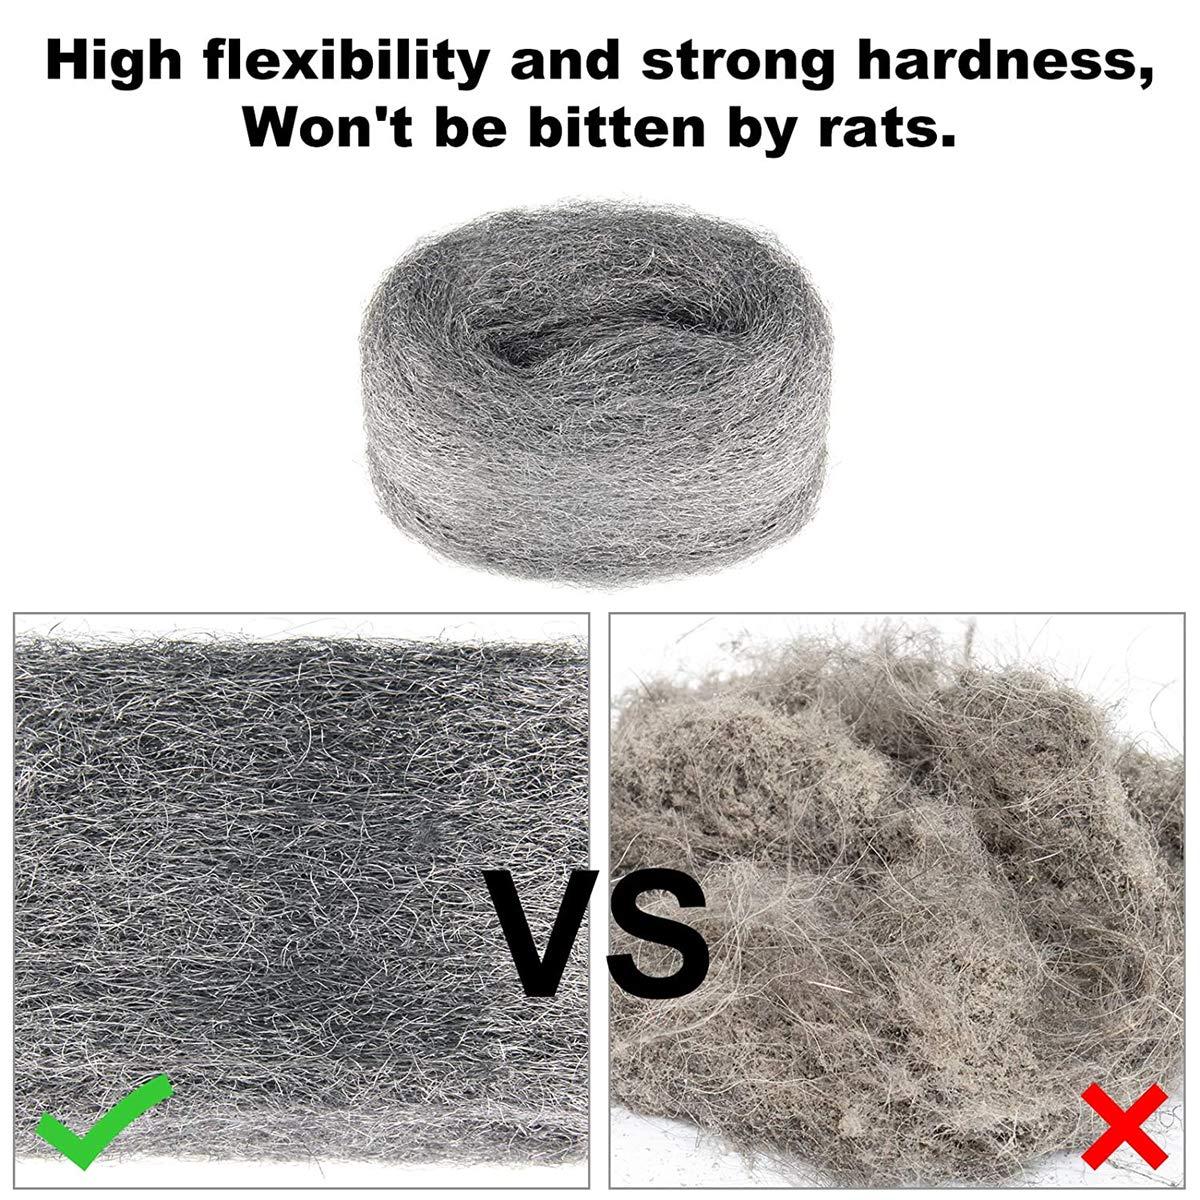 Hardware Cloth 2-Pack x 10FT House//Pipelinehole Gap Blocker DIY Kit Steel Wool for Mouse Blocker EACFVE Steel Wool Fabric 0000